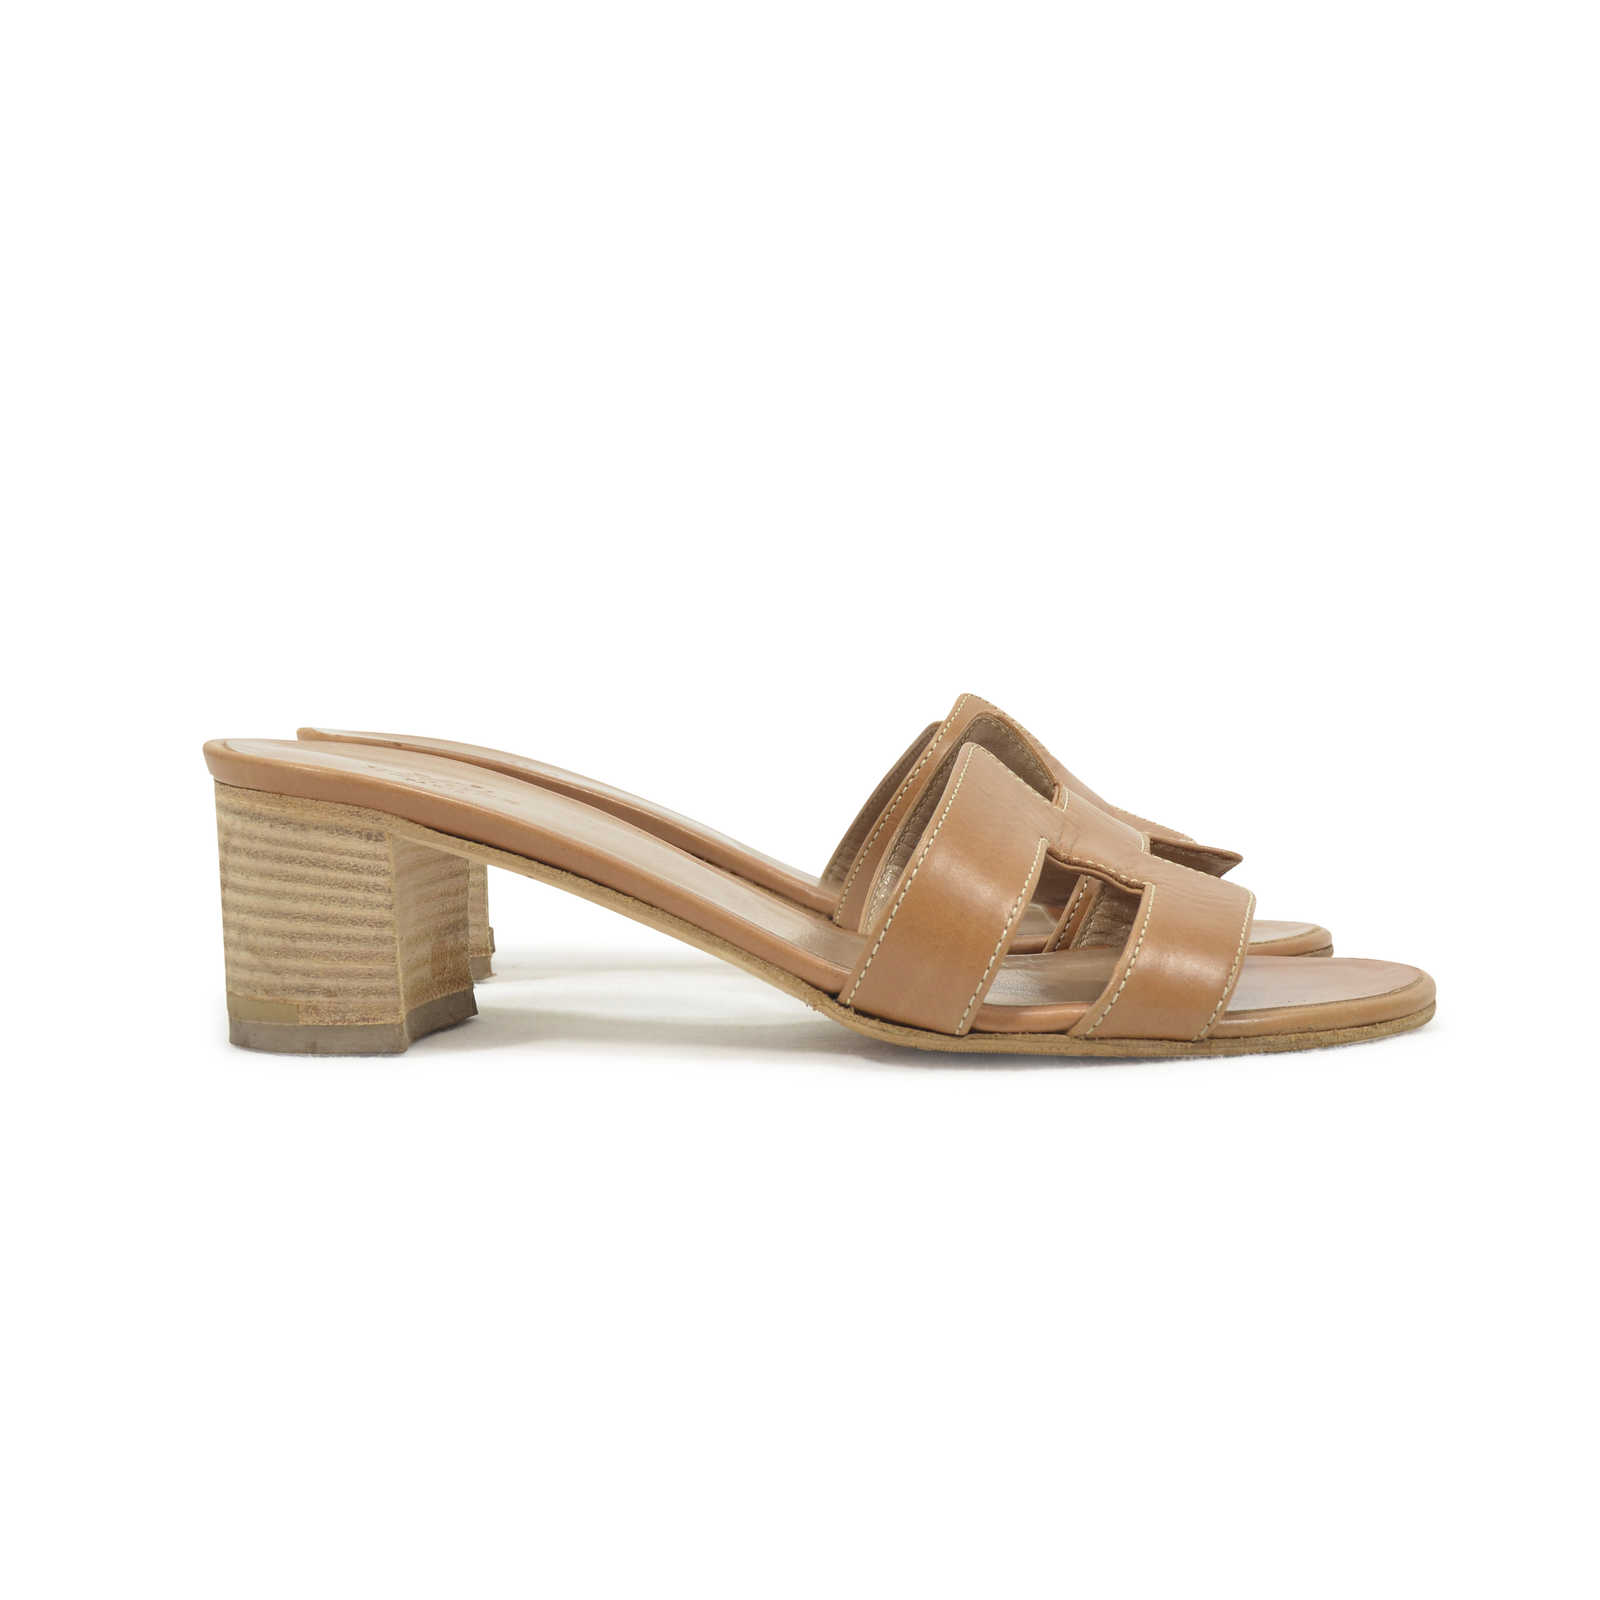 60f082b4a14c ... Authentic Second Hand Hermès Oasis Sandals (PSS-311-00019) - Thumbnail  3 ...